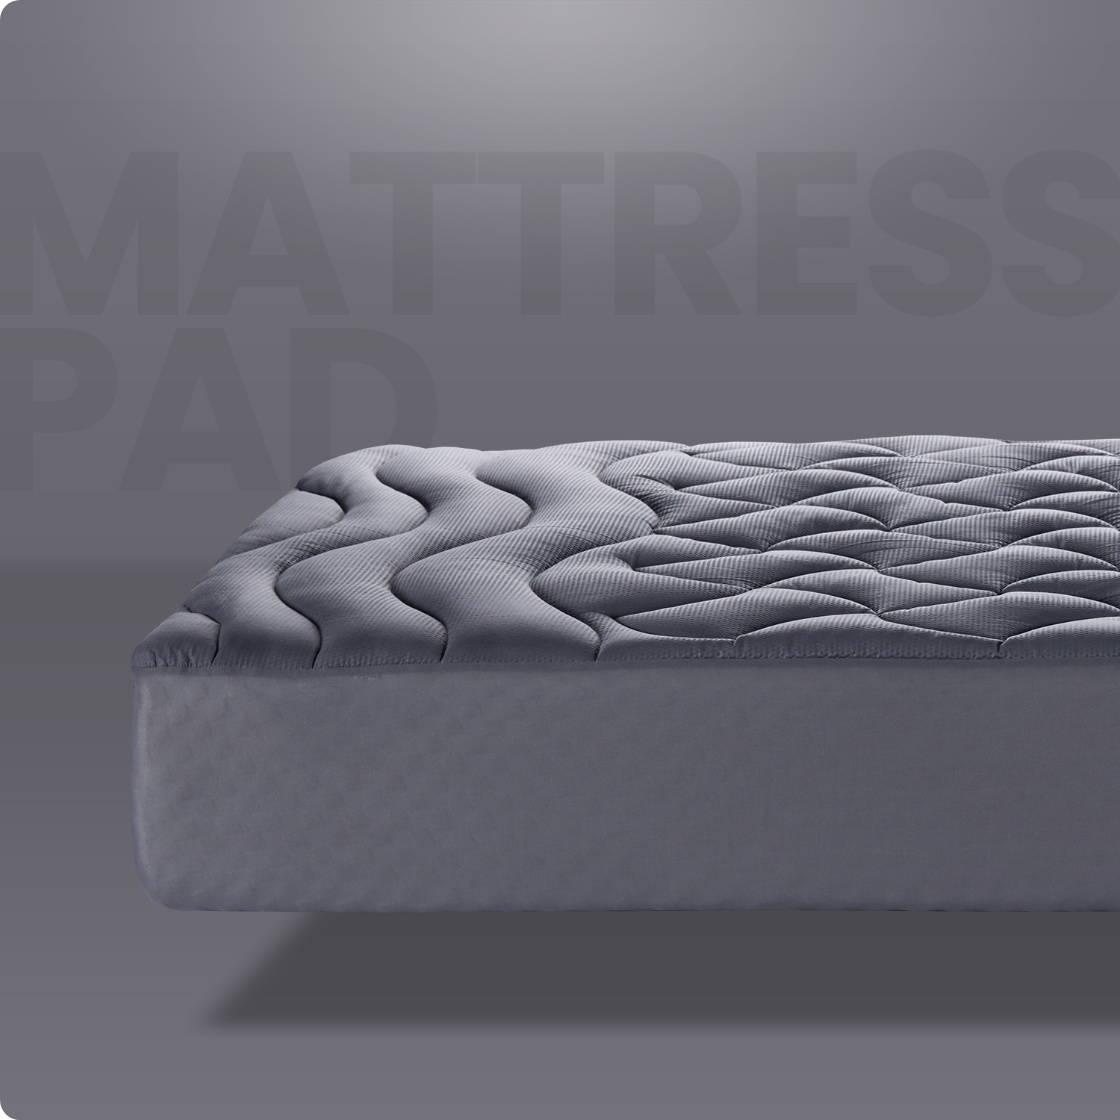 sleep zone bedding 3 zone mattress pad grey gray